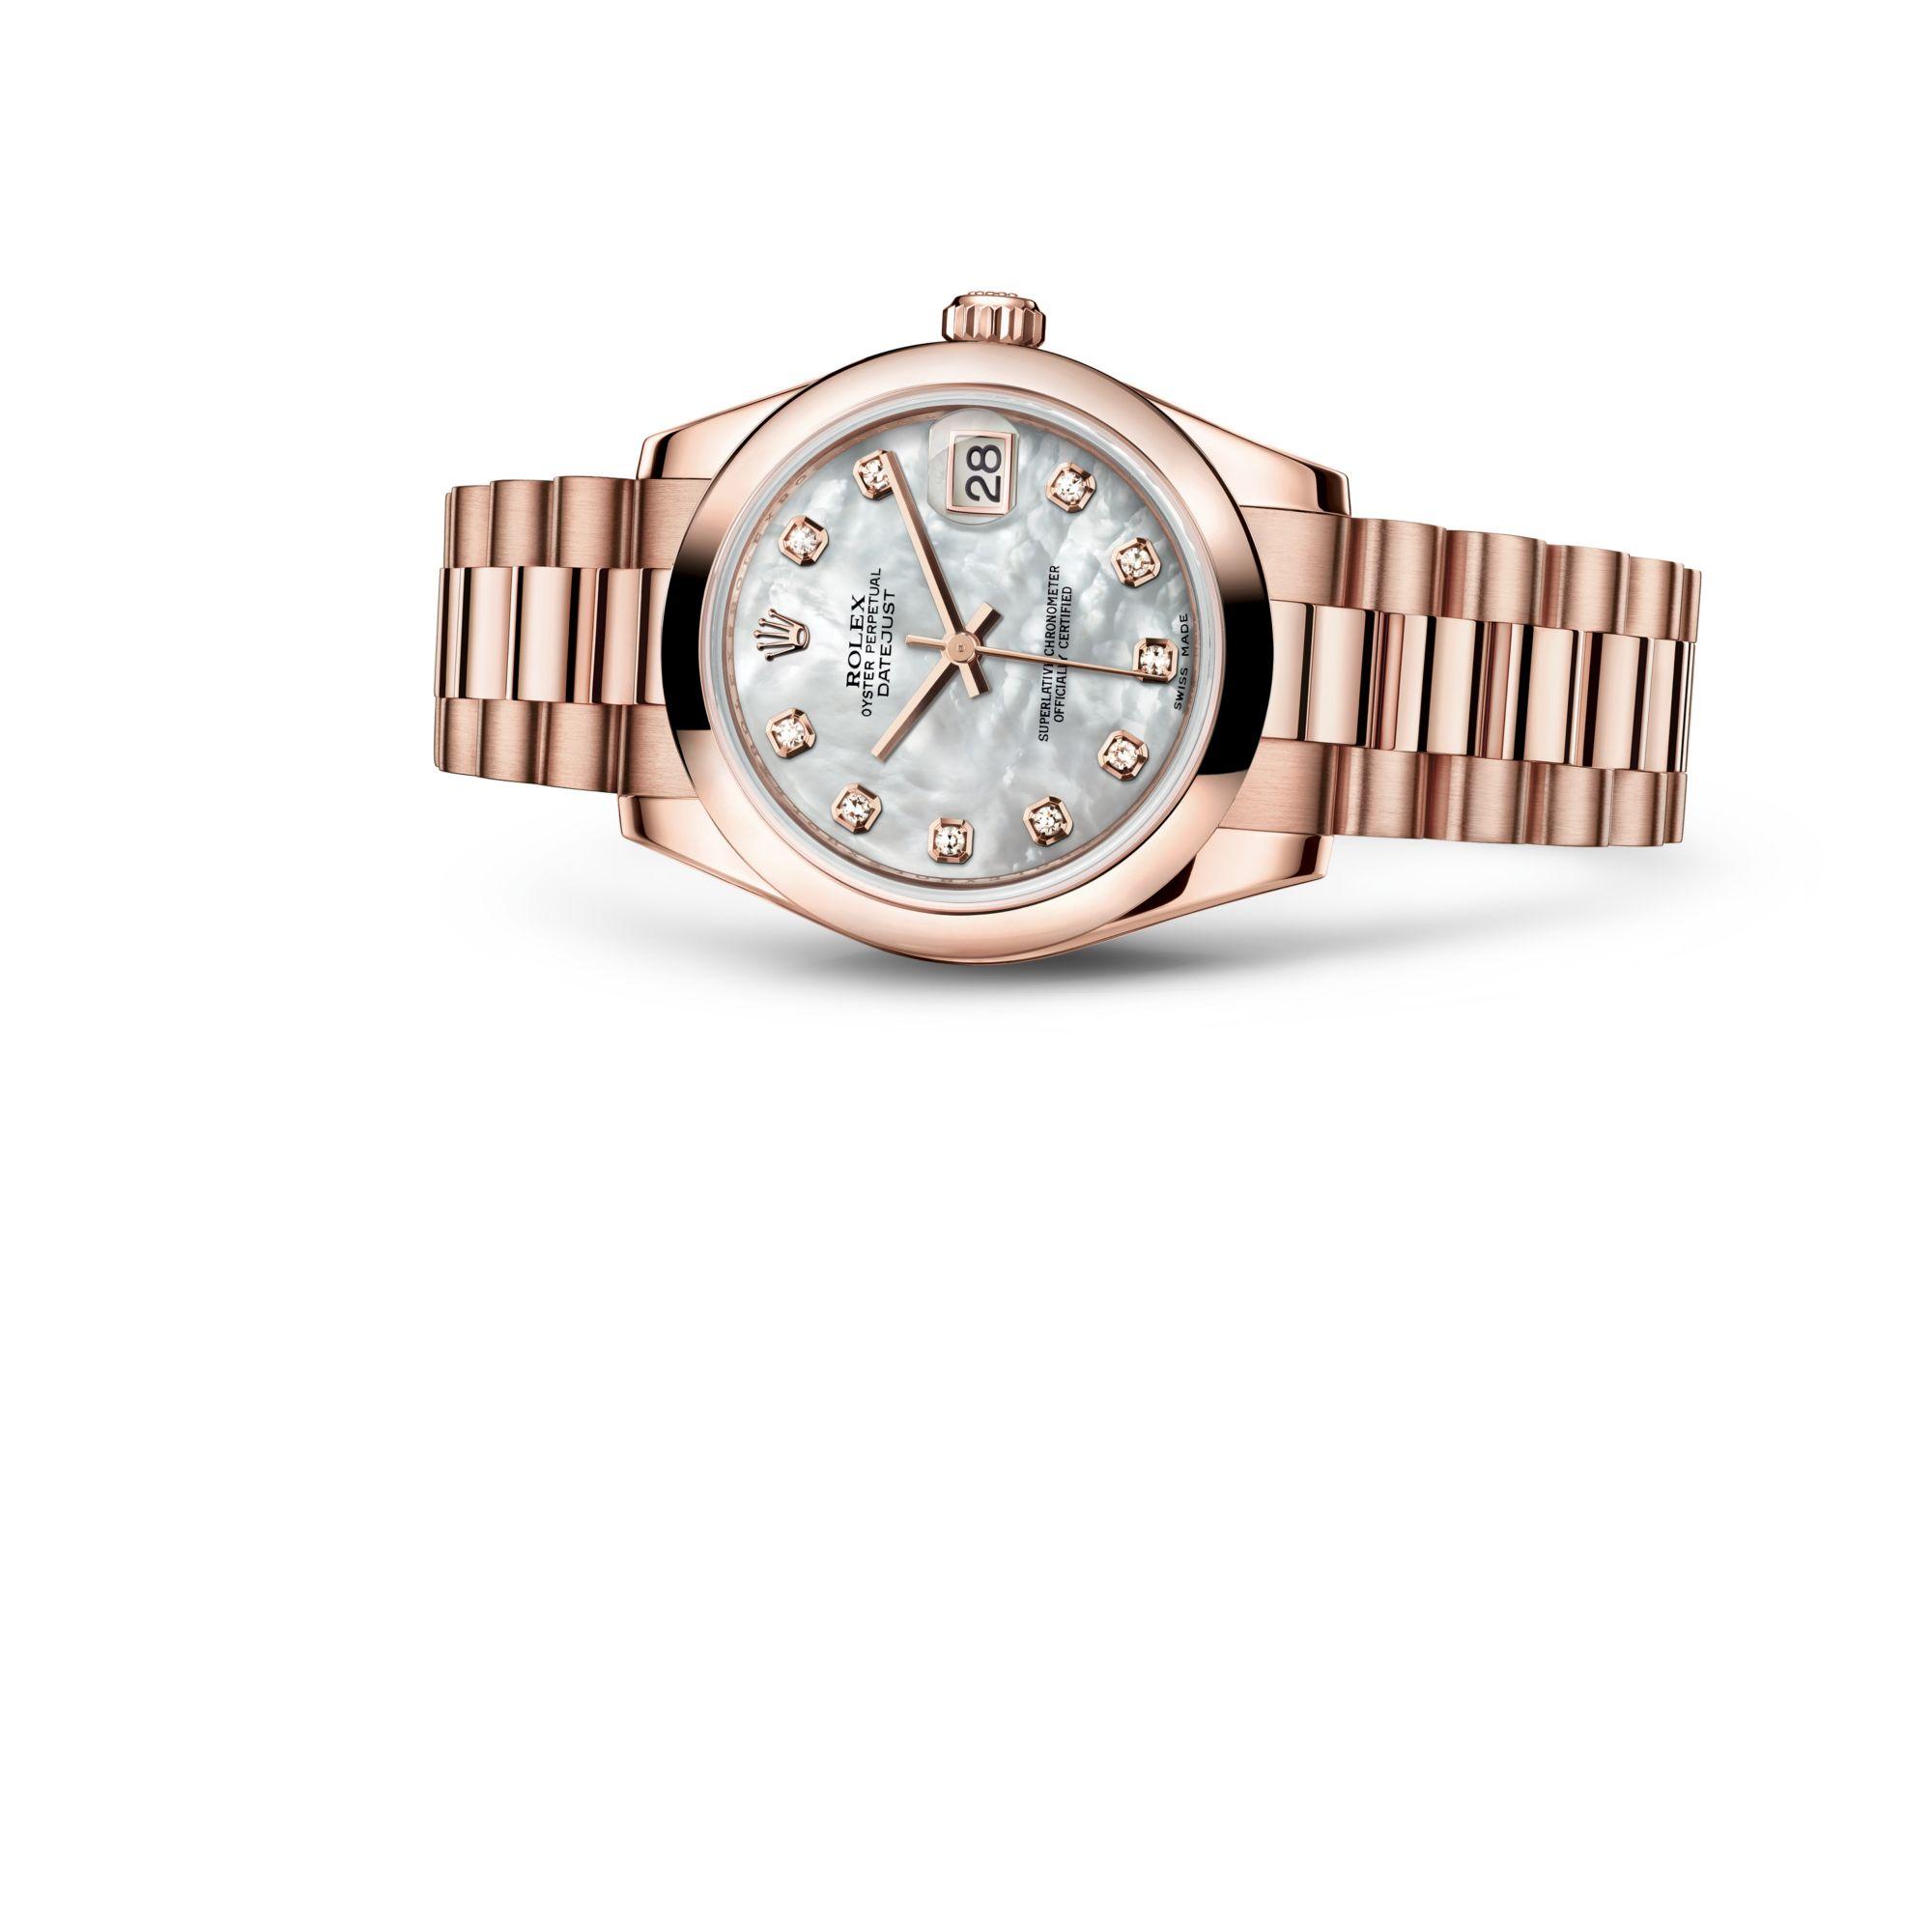 Rolex デイトジャスト 31 M178245F-0026